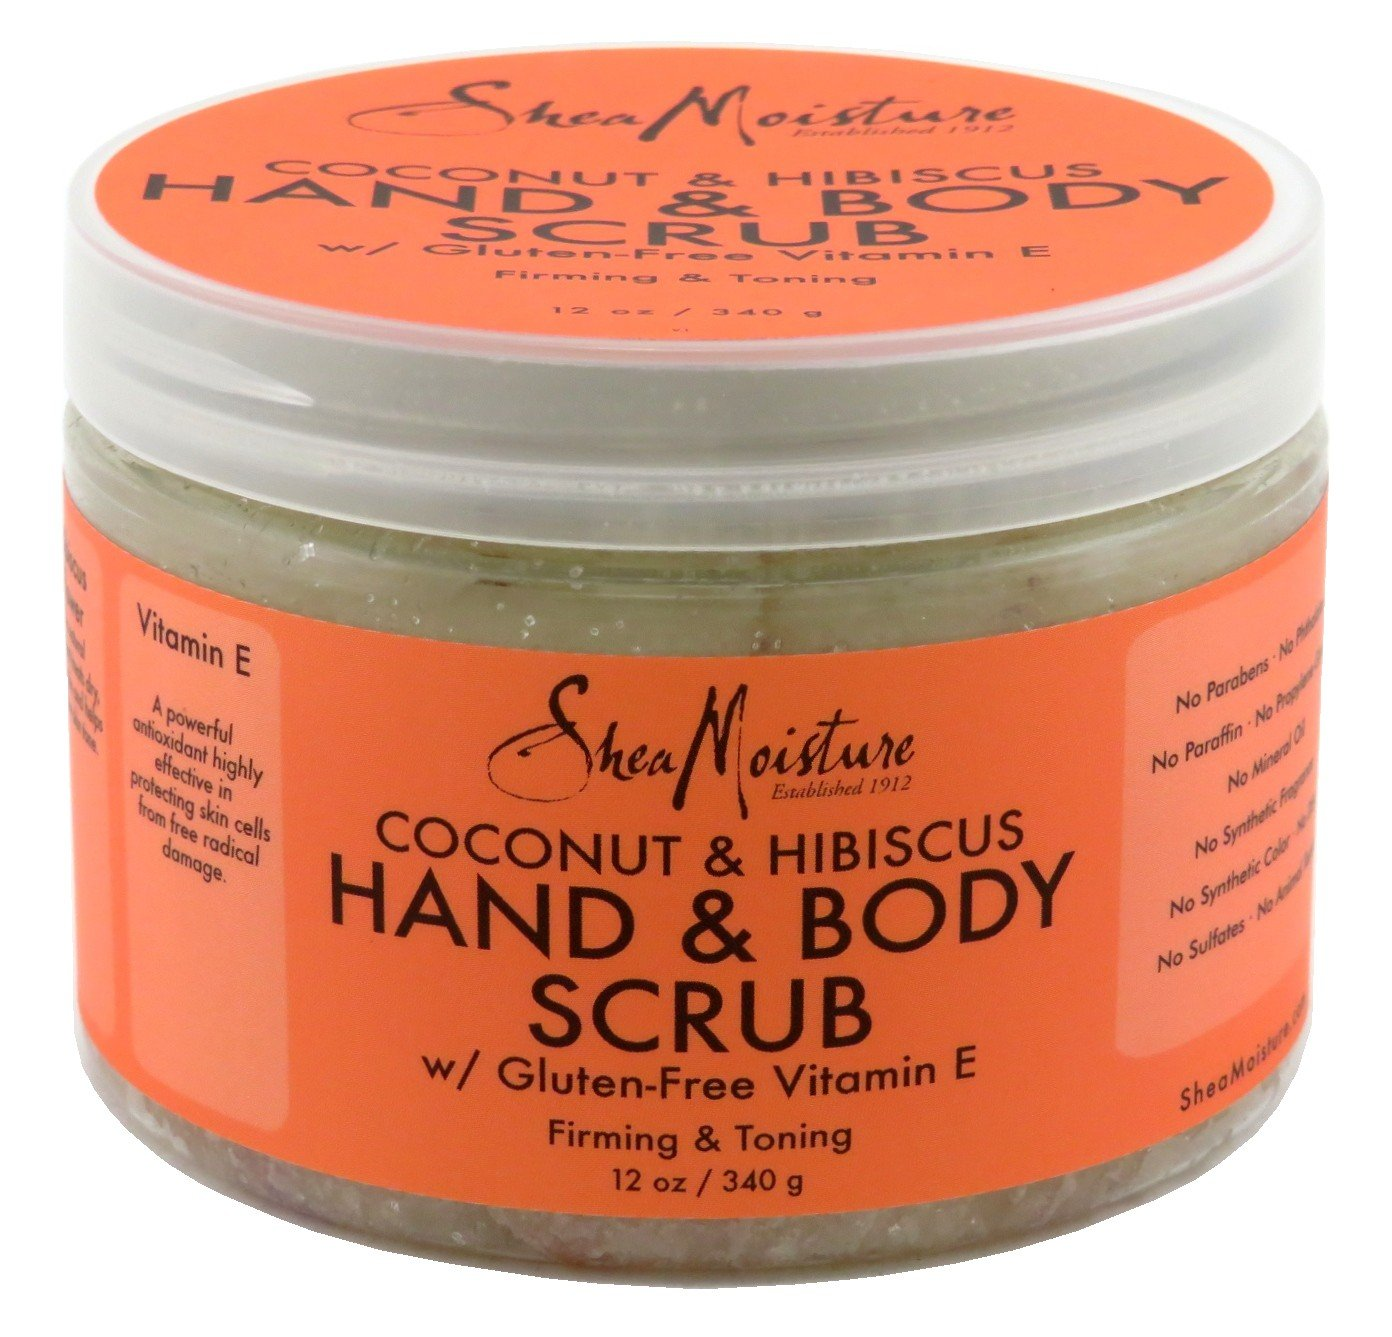 Shea Moisture Body Scrub Coconut and Hibiscus by Shea Moisture B00A2WHOD2